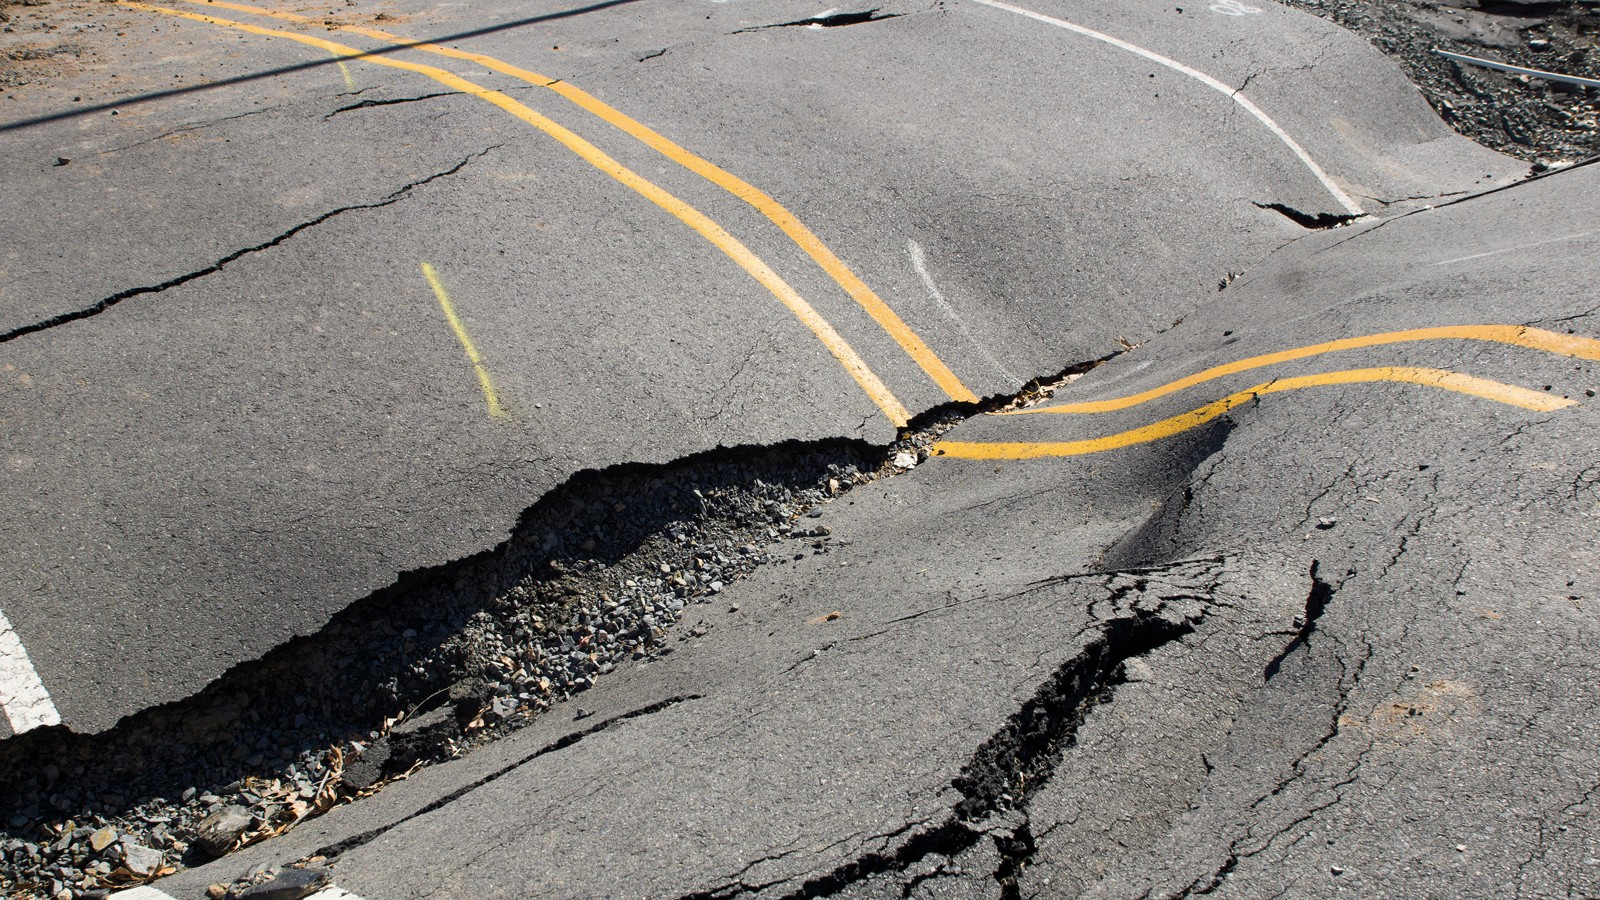 Cracks in the road, roadway violation